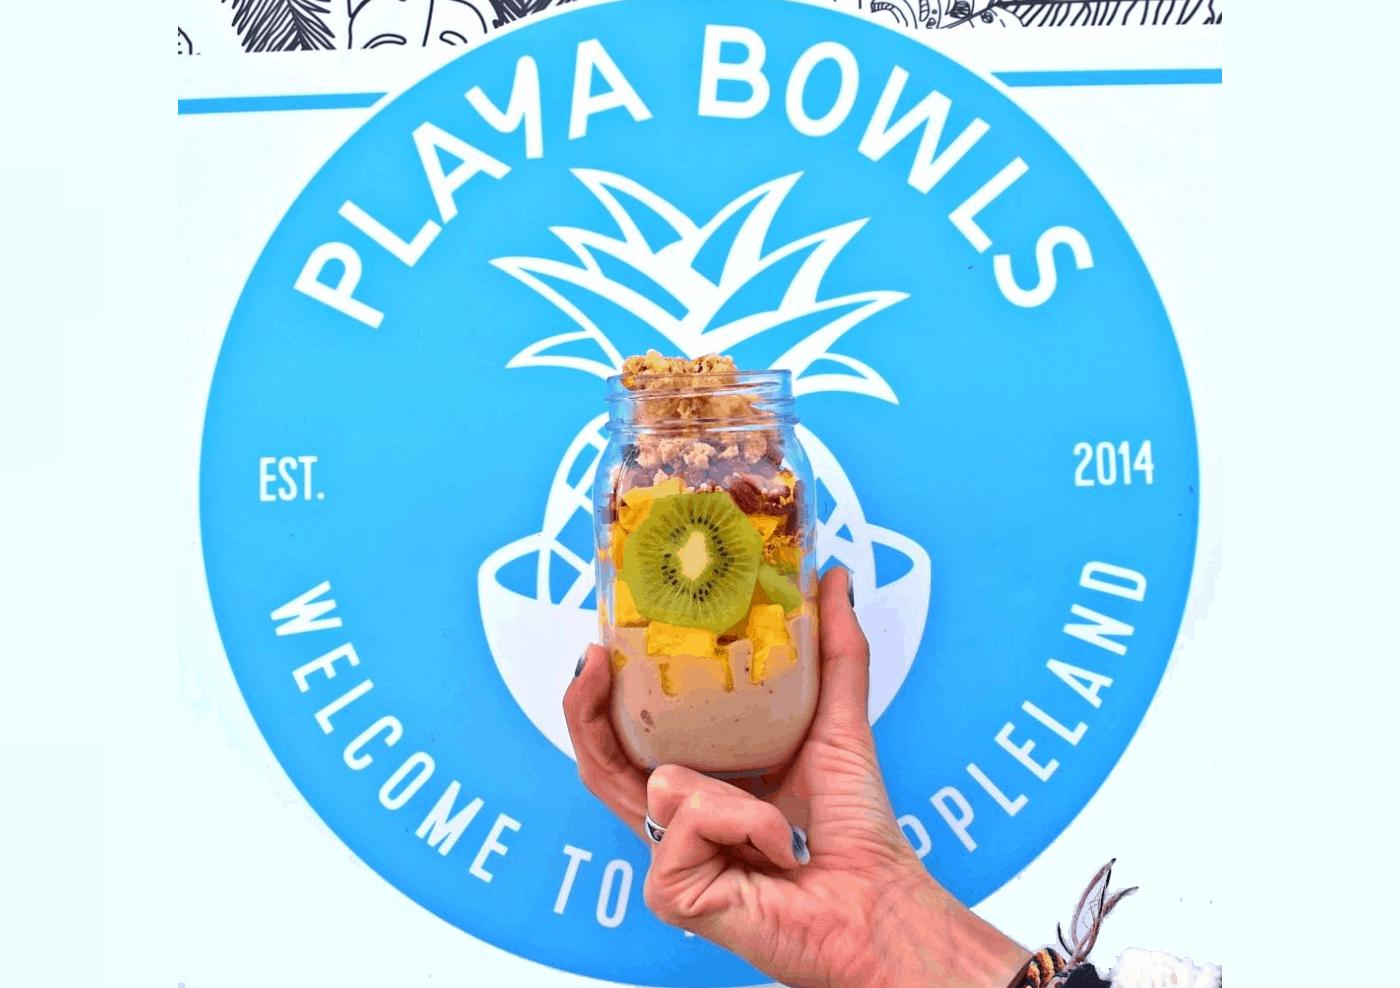 Welcome Playa Bowls To The Wildwood Boardwalk